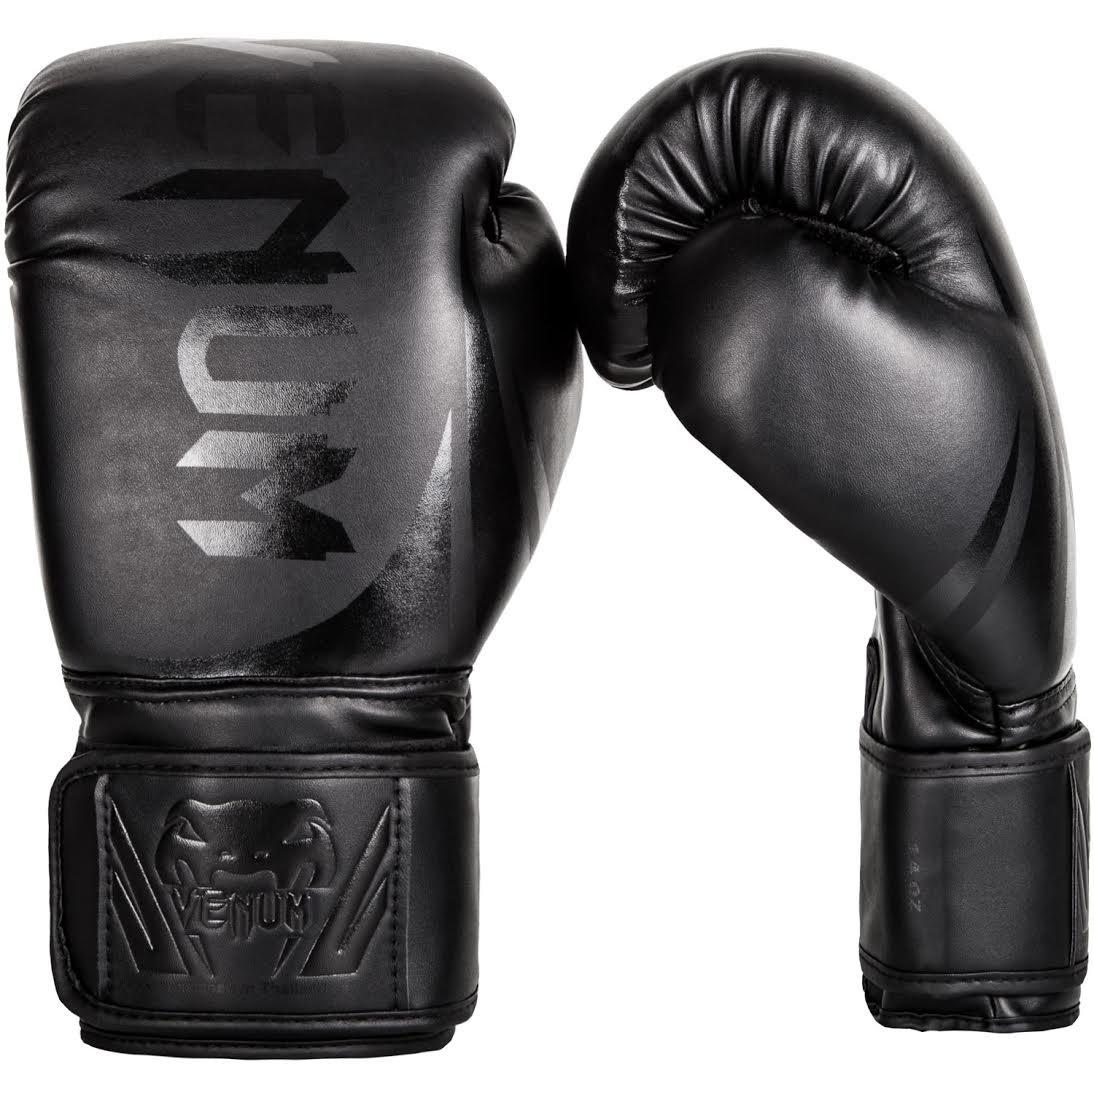 Venum Challenger 2.0 Boxing Gloves - Black/Black - 8-Ounce